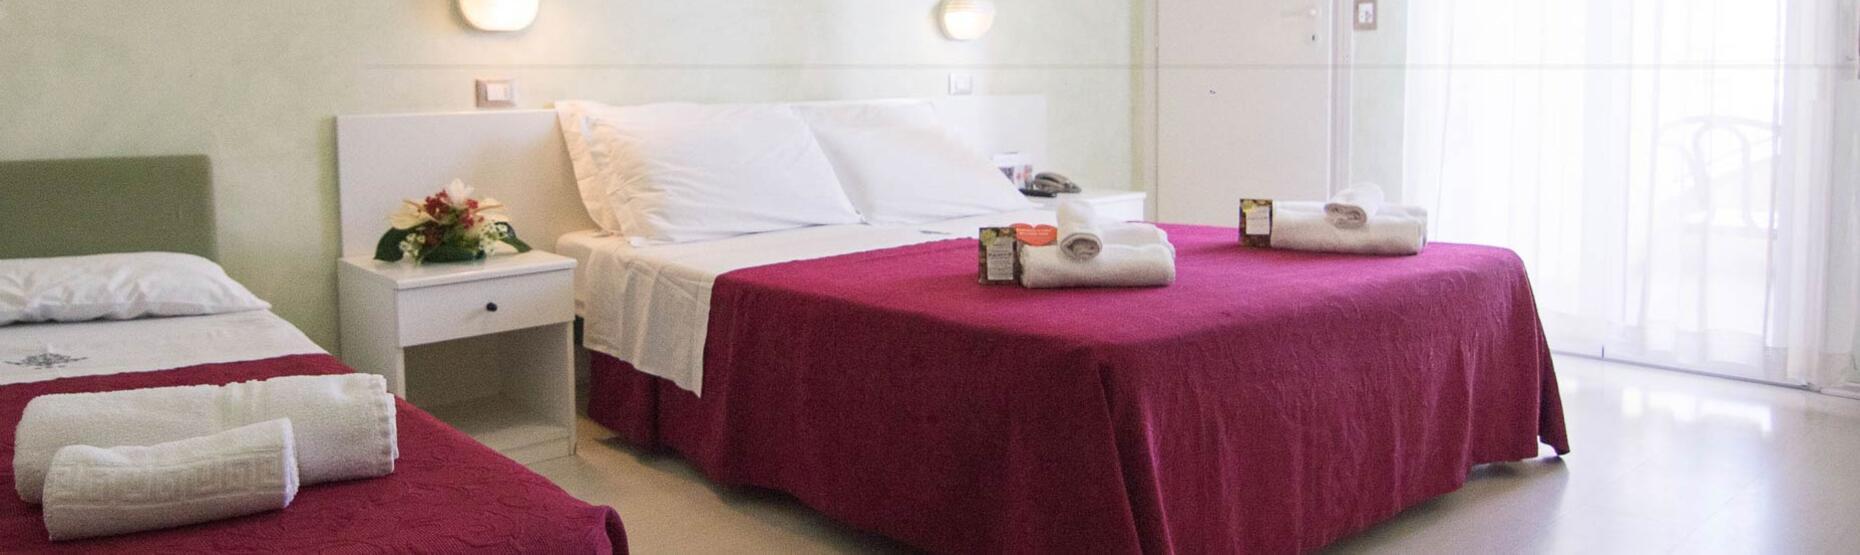 hoteldeiplatani en eco-hotel 019